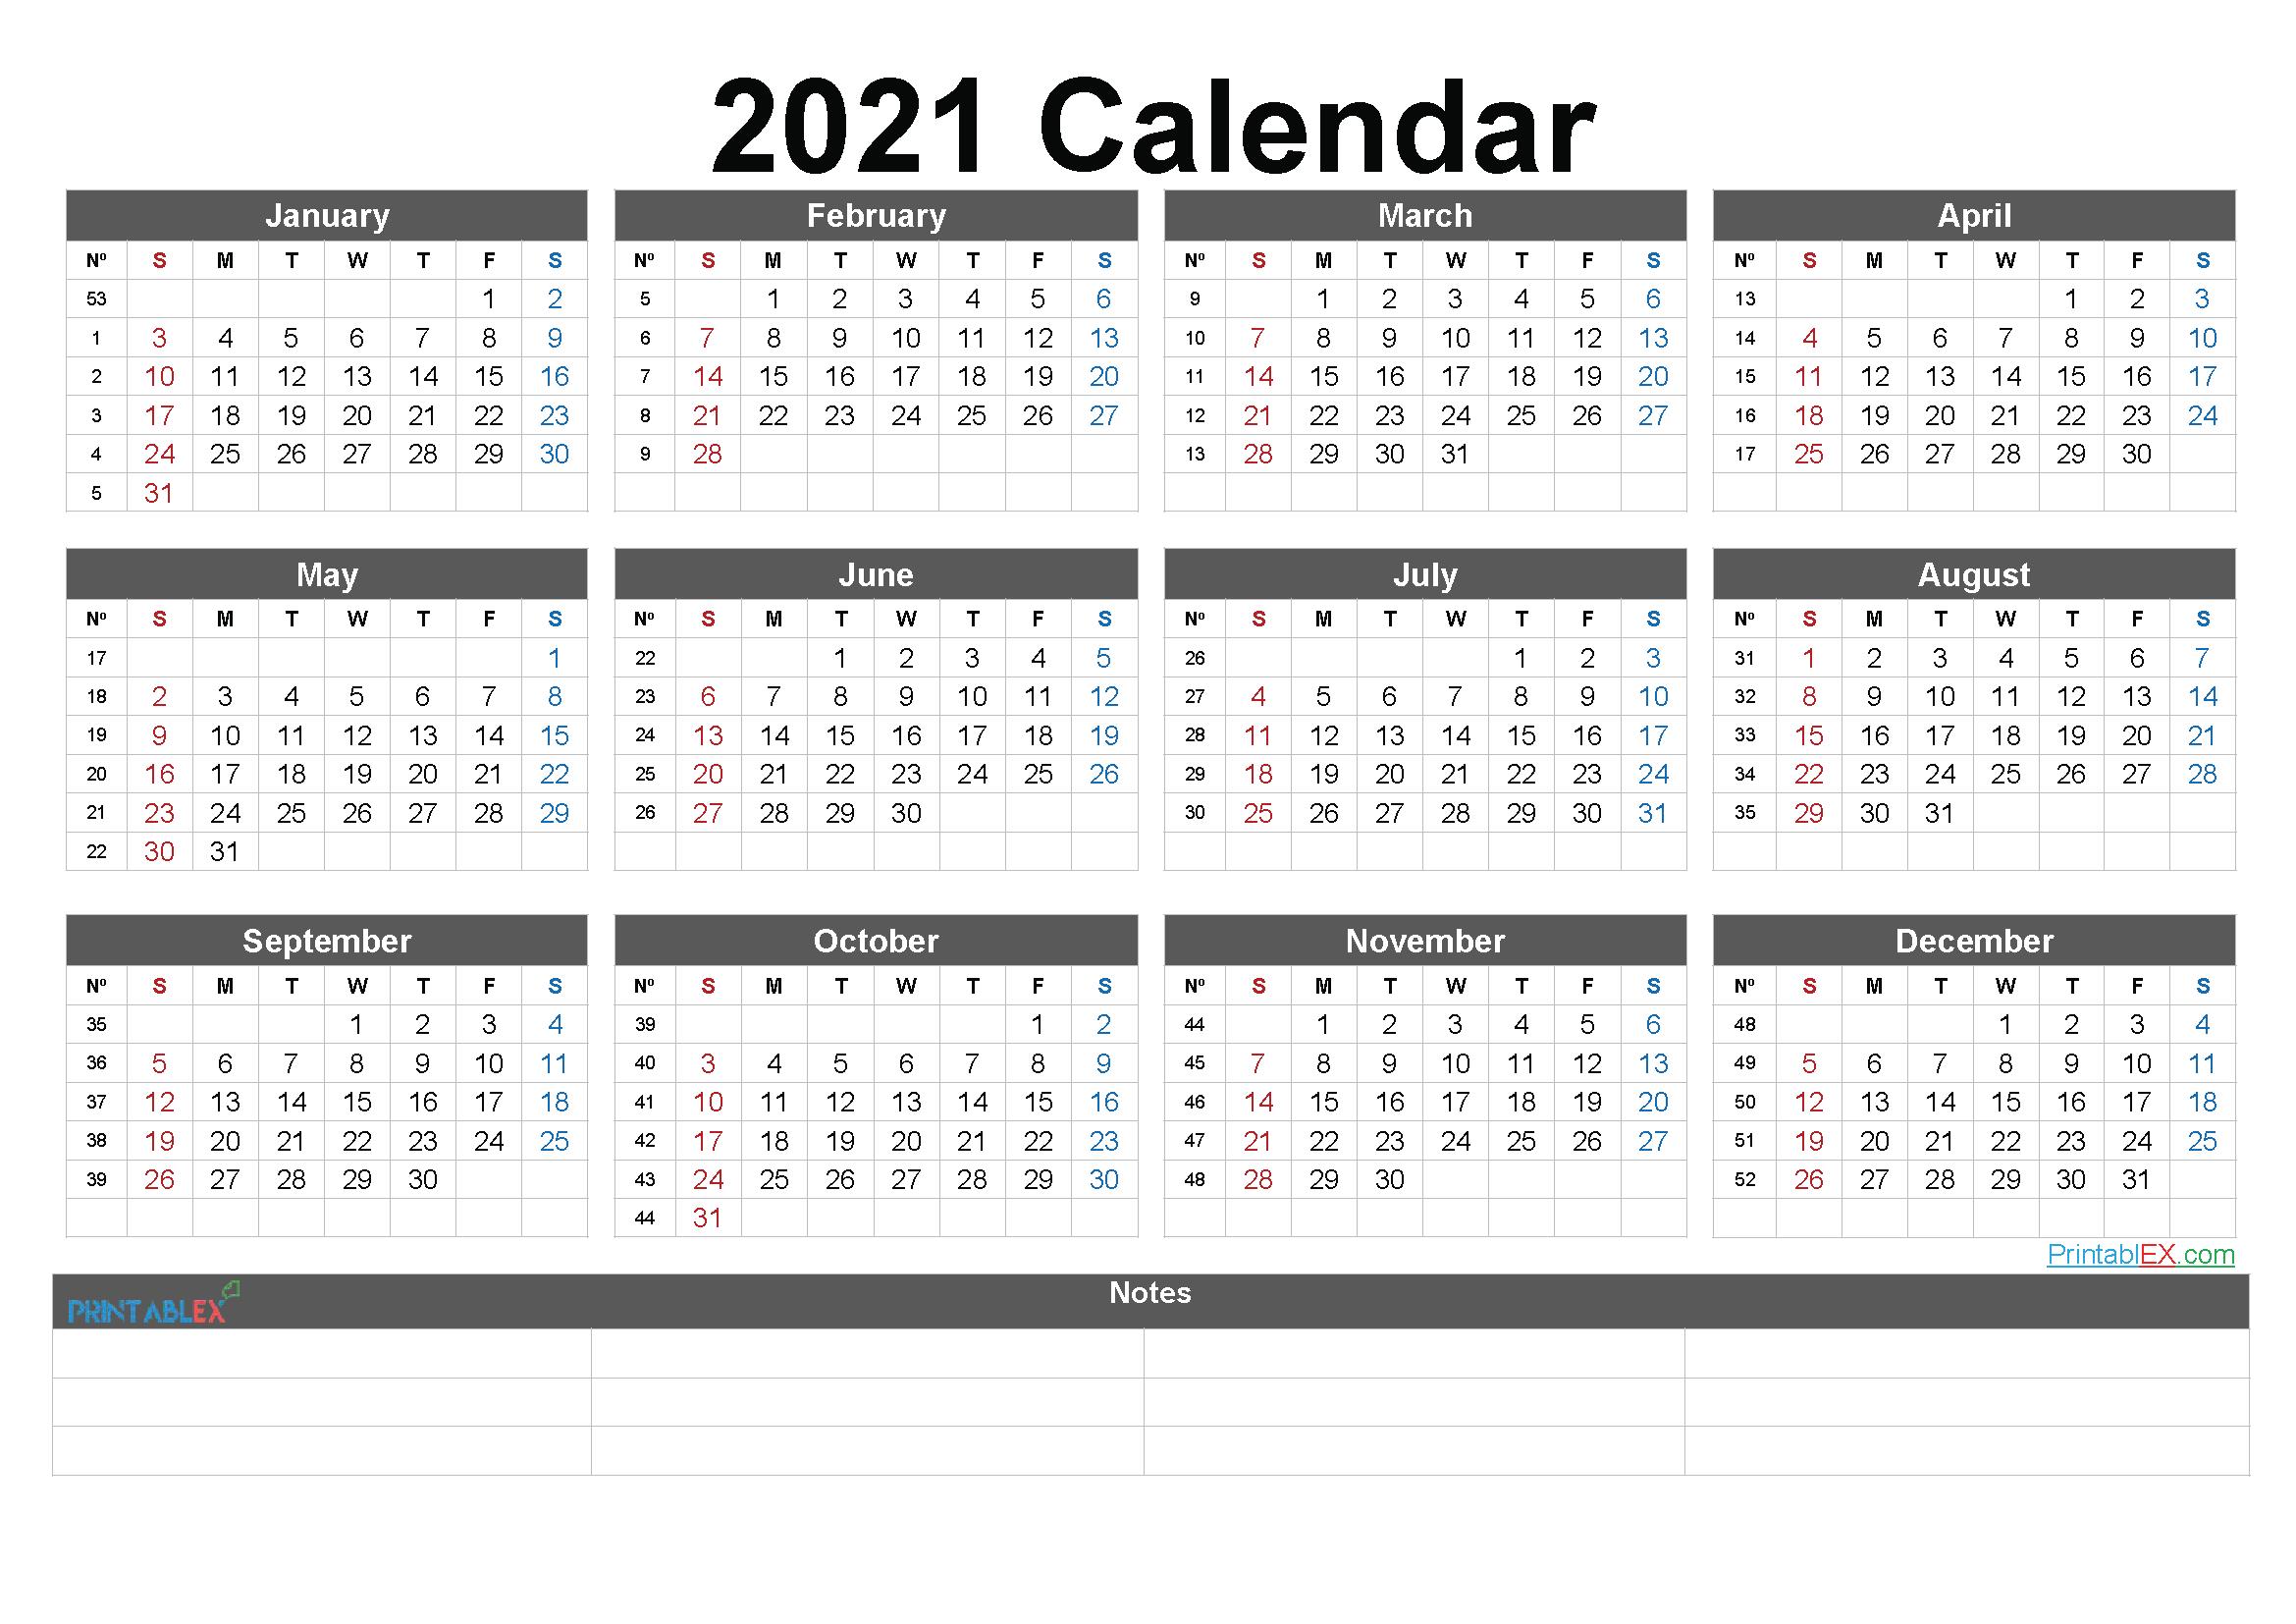 2021 Printable Yearly Calendar With Week Numbers – Free